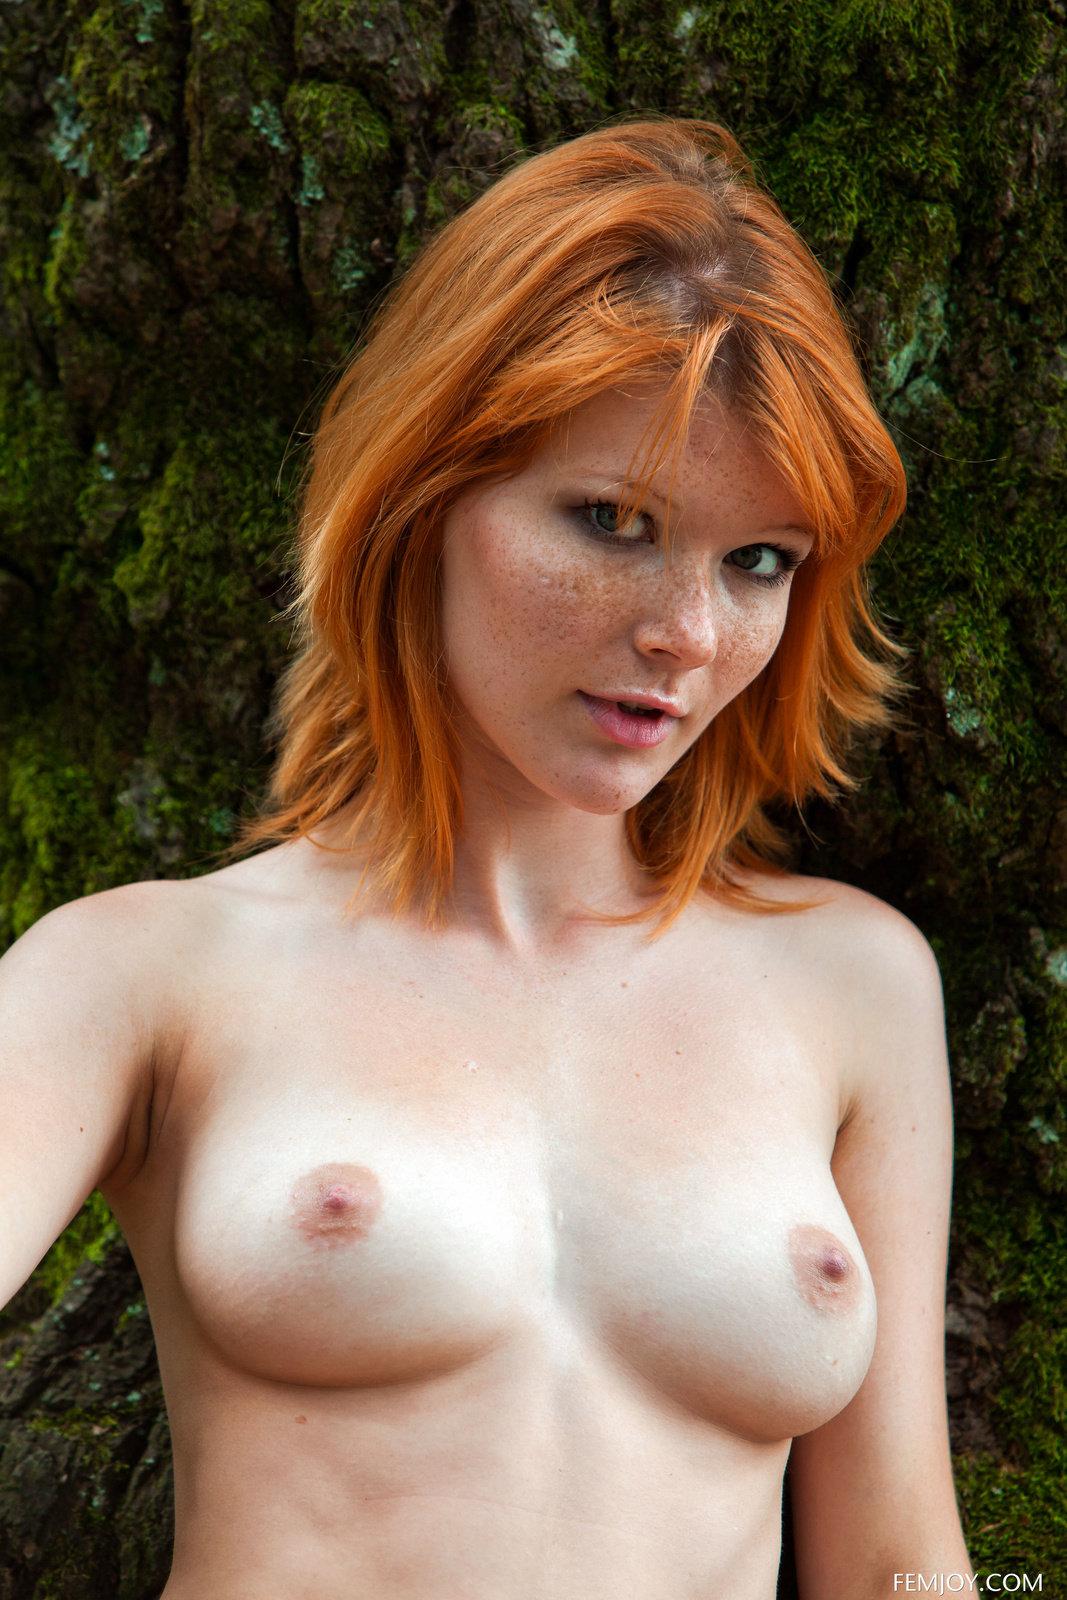 Virgin colorado redhead girls naked nerd